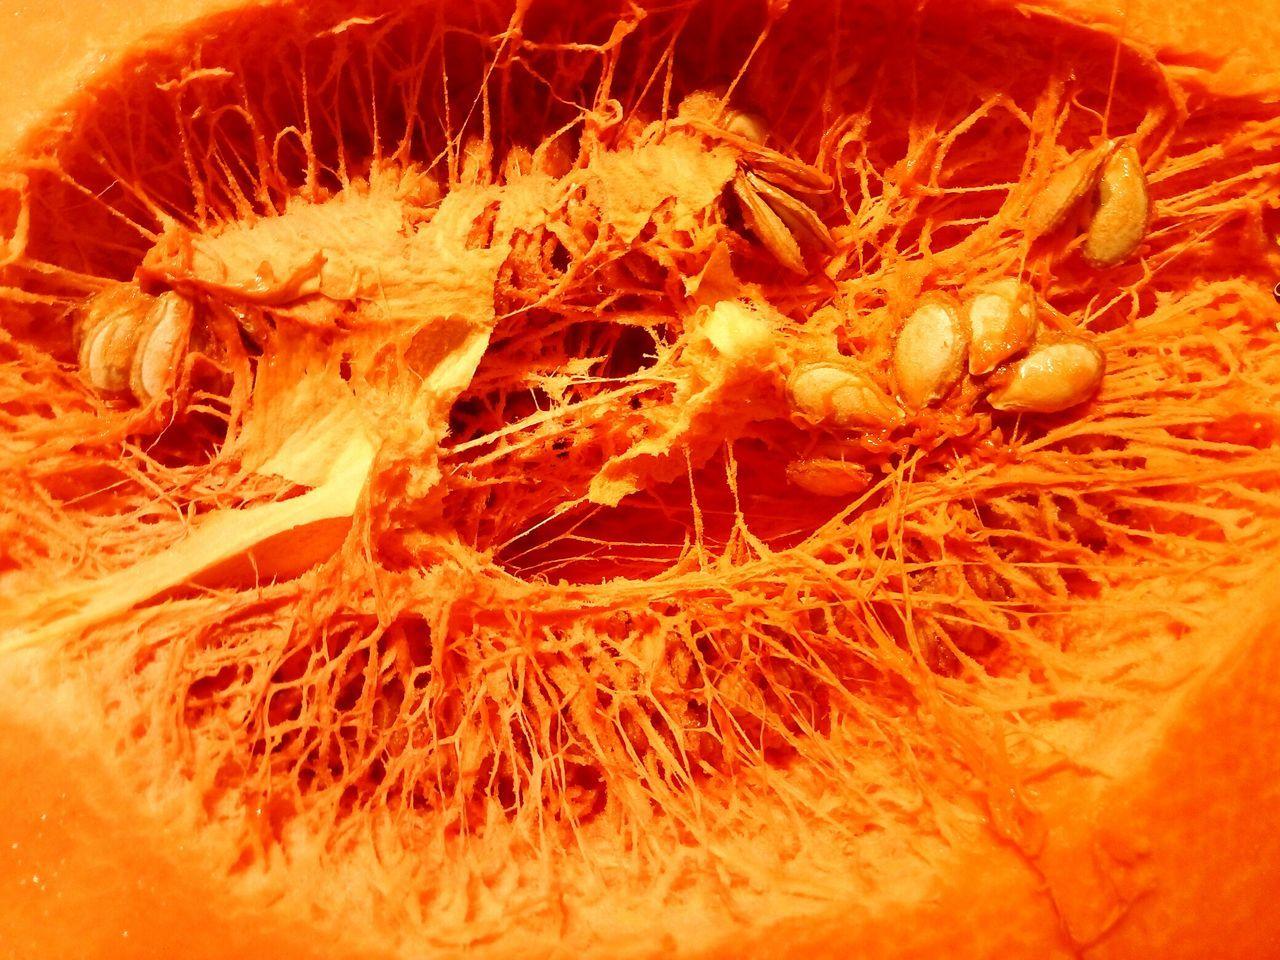 Pumpkin Nature Marketplace Close-up Fresh No People Early Morning Day Freshness Freshfruits Inside Things